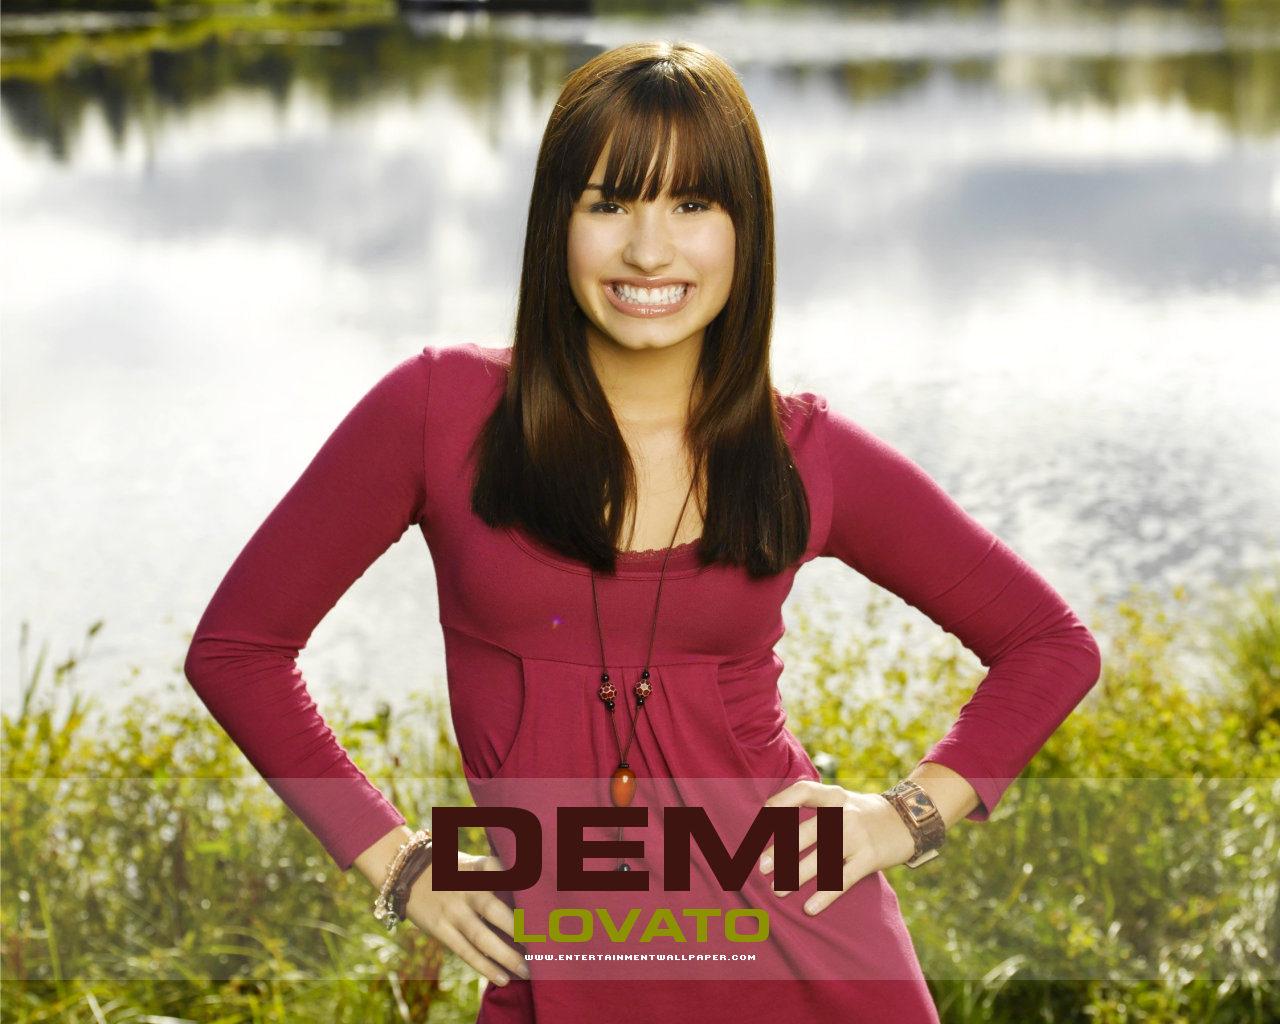 http://2.bp.blogspot.com/-S___up9h-FI/TrtWnveDn7I/AAAAAAAAAME/8bpsb_Q60Is/s1600/Demi+Lovato+Wallpaper+%25287%2529.jpg